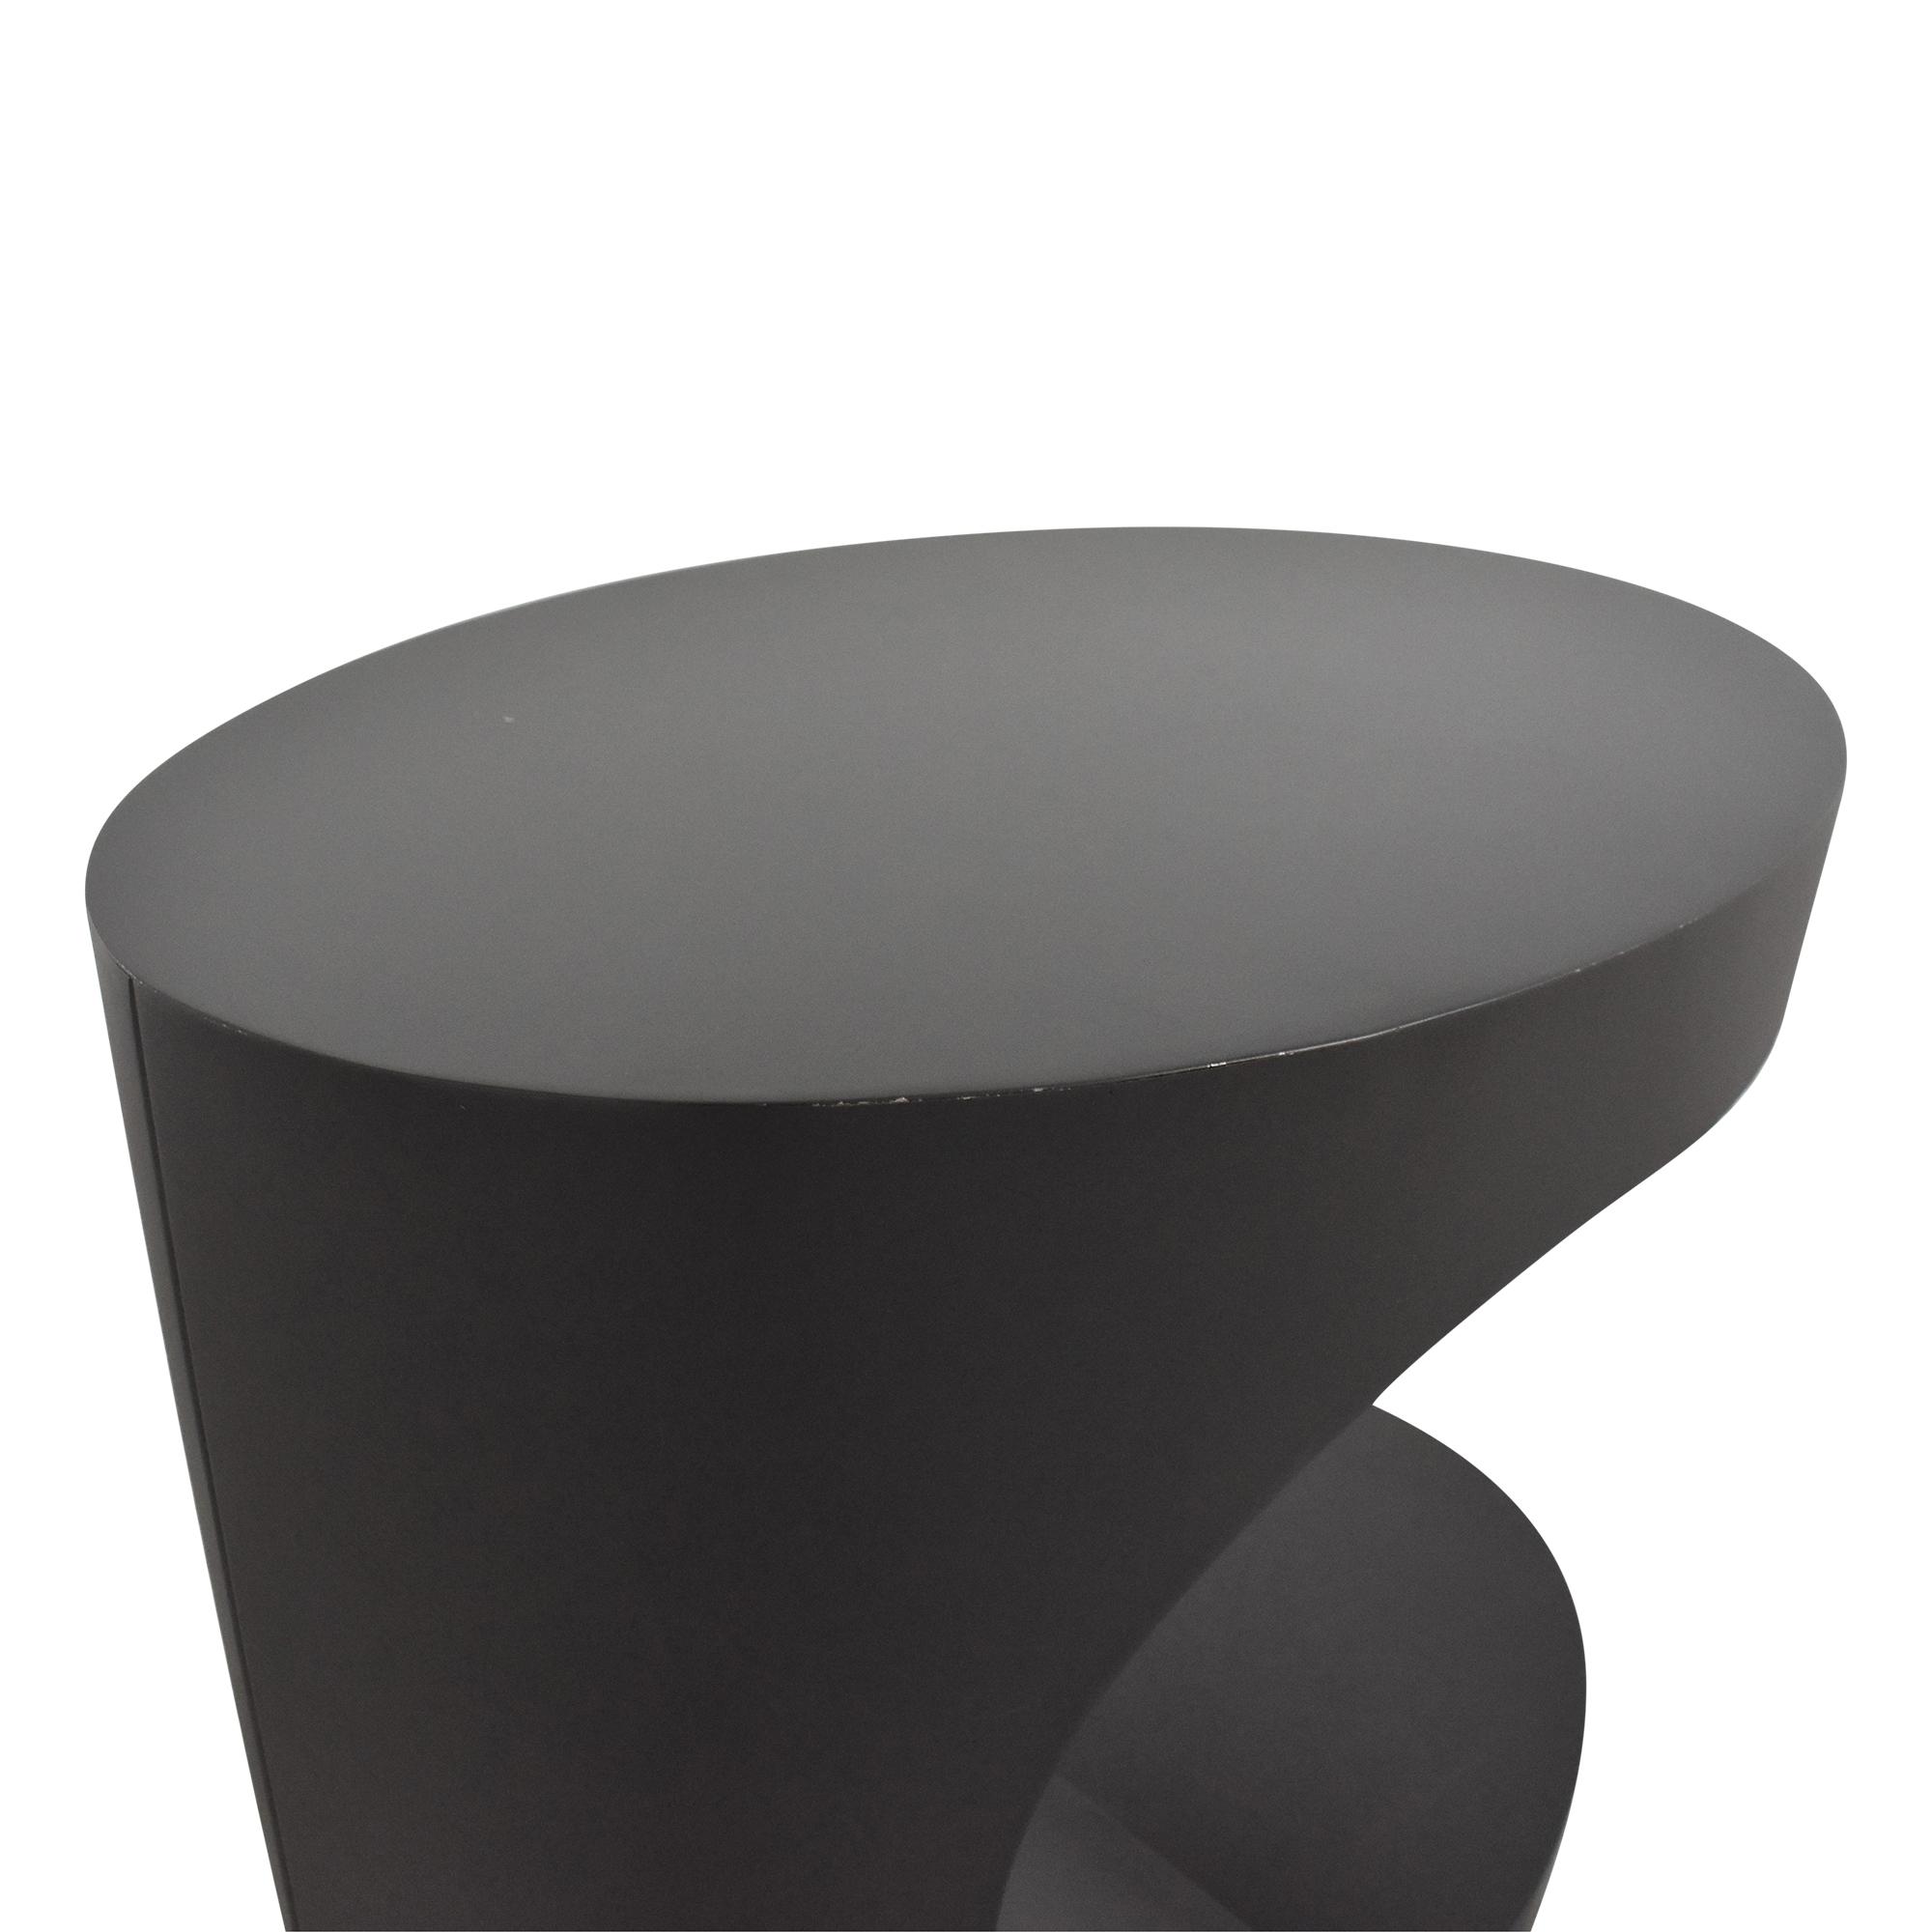 buy Room & Board Ellipse C-Table Room & Board Tables